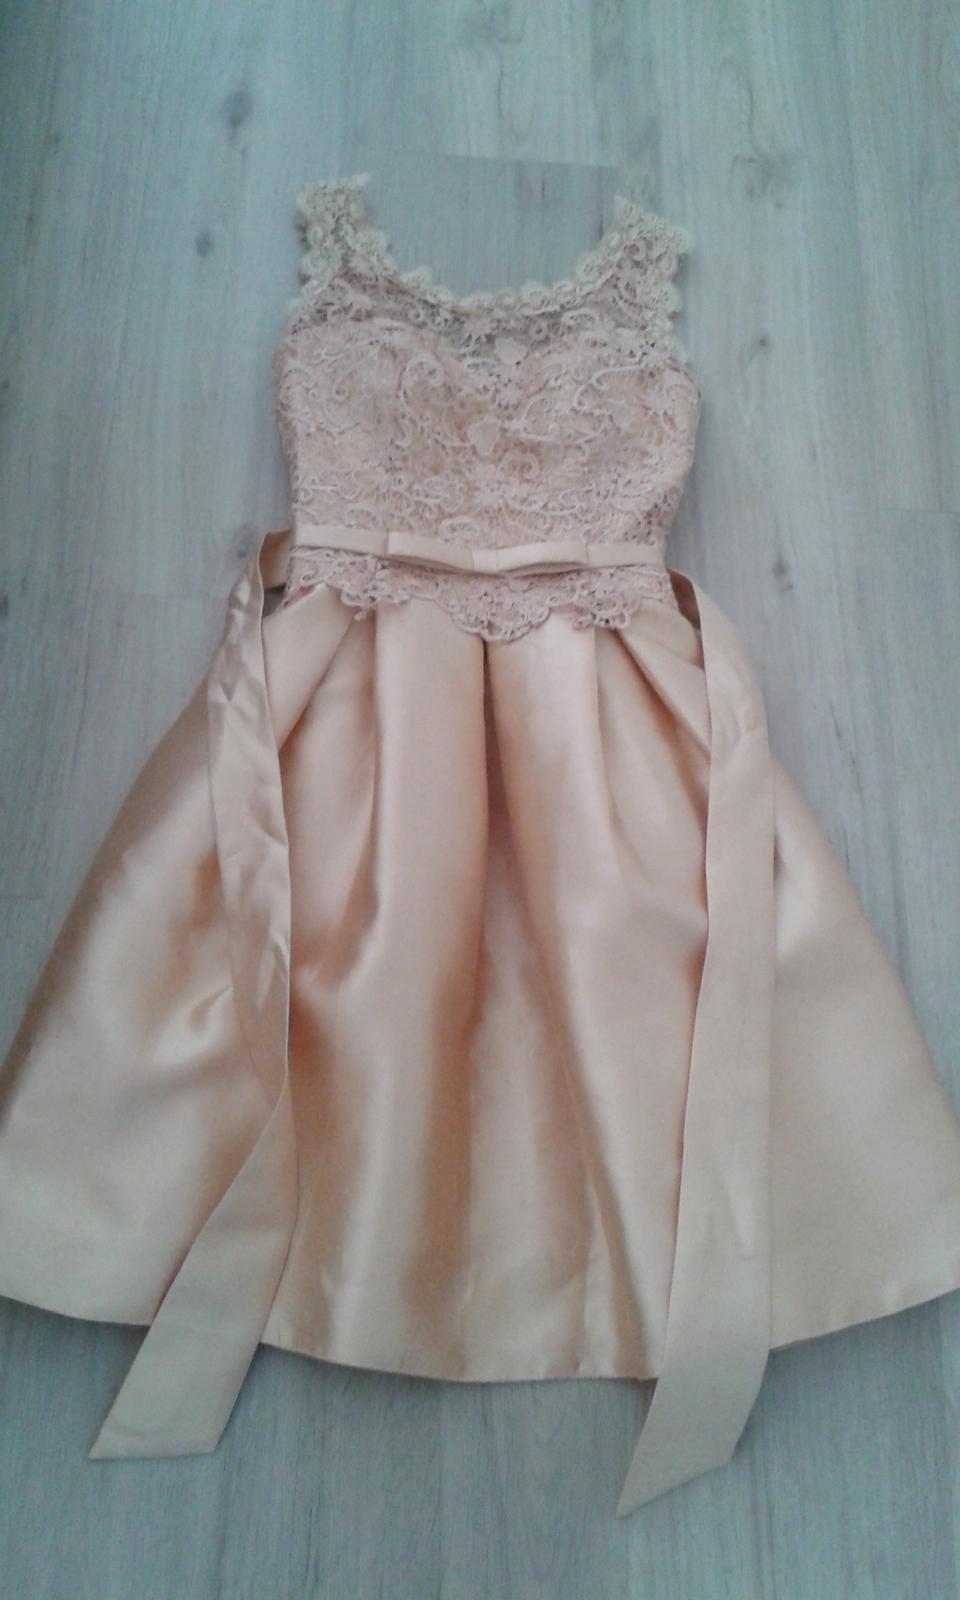 Zlaté spoločenské šaty veľ. S/M - Obrázok č. 1